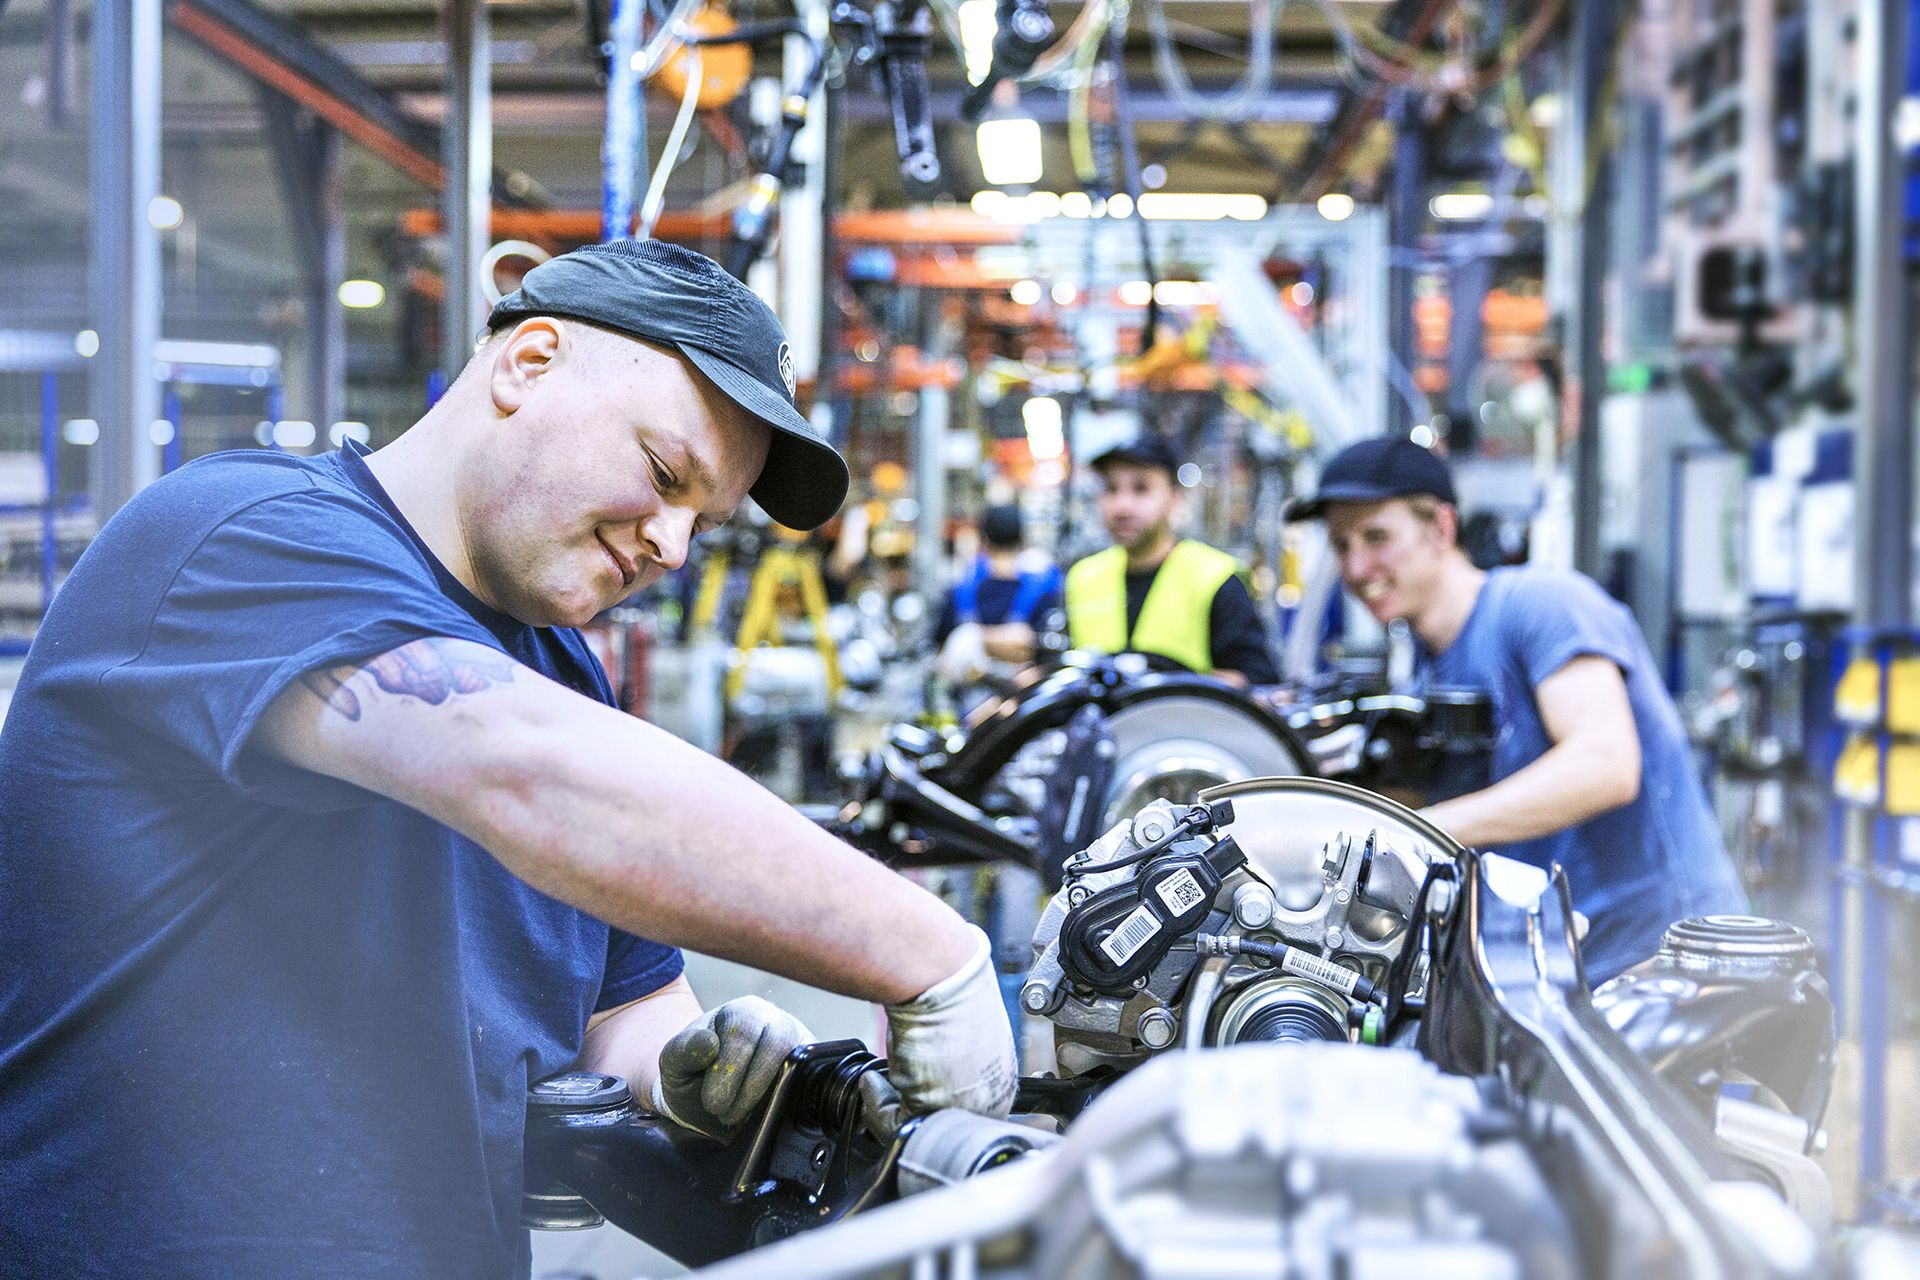 thyssenkrupp offers automotive jobs.